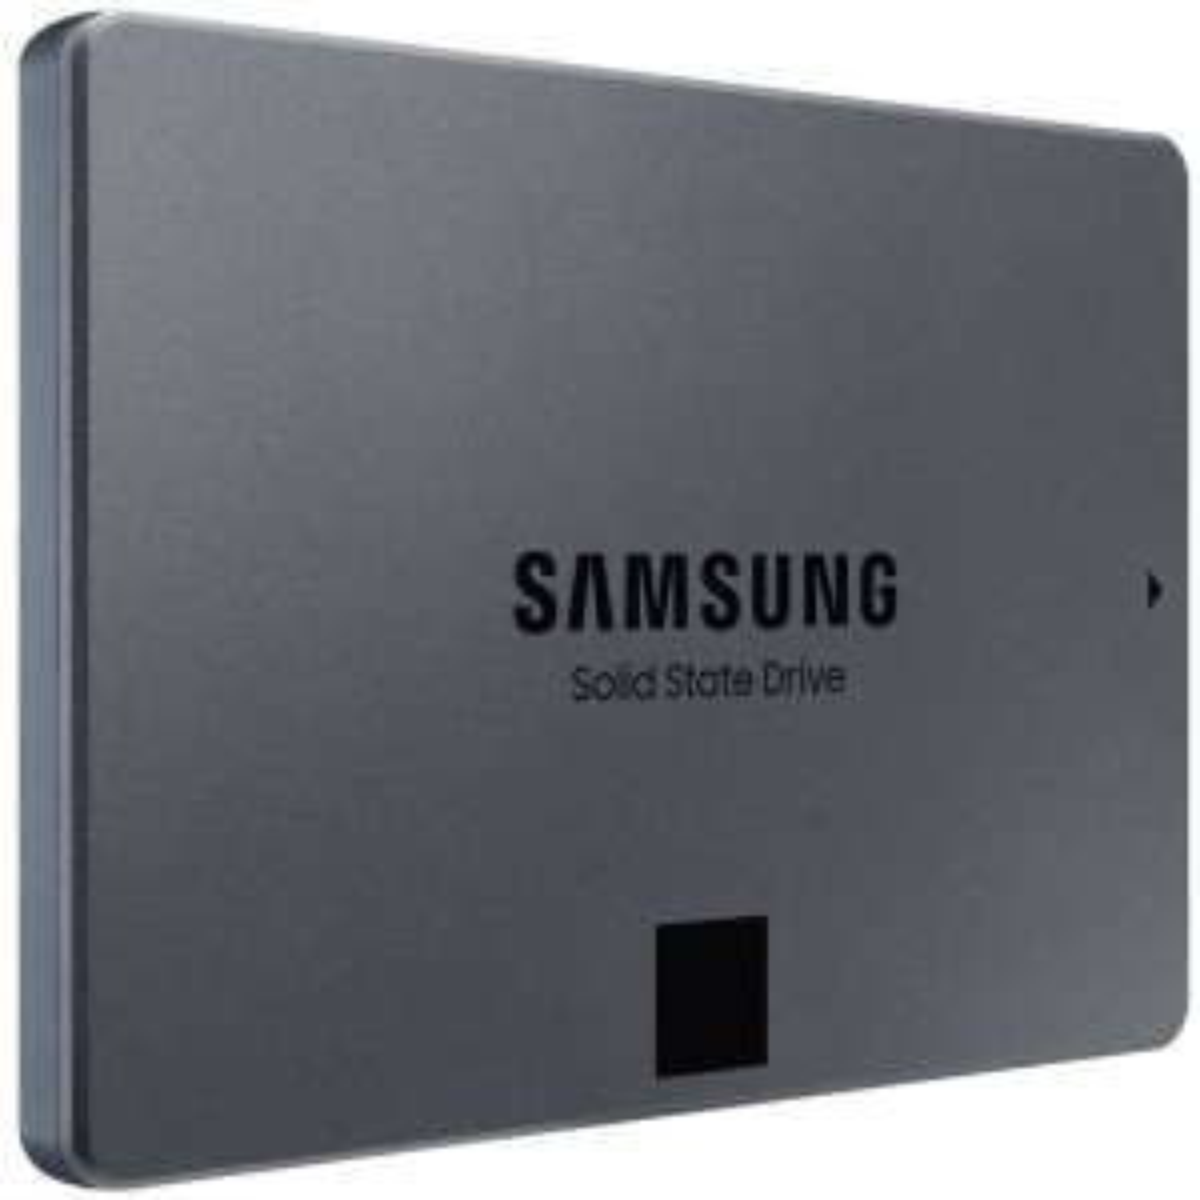 "SSD interne 2.5"" Samsung 870 QVO - 1 To (72.99€ avec RAKUTEN7 + 2.19€ en Rakuten Points) - Vendeur Boulanger"